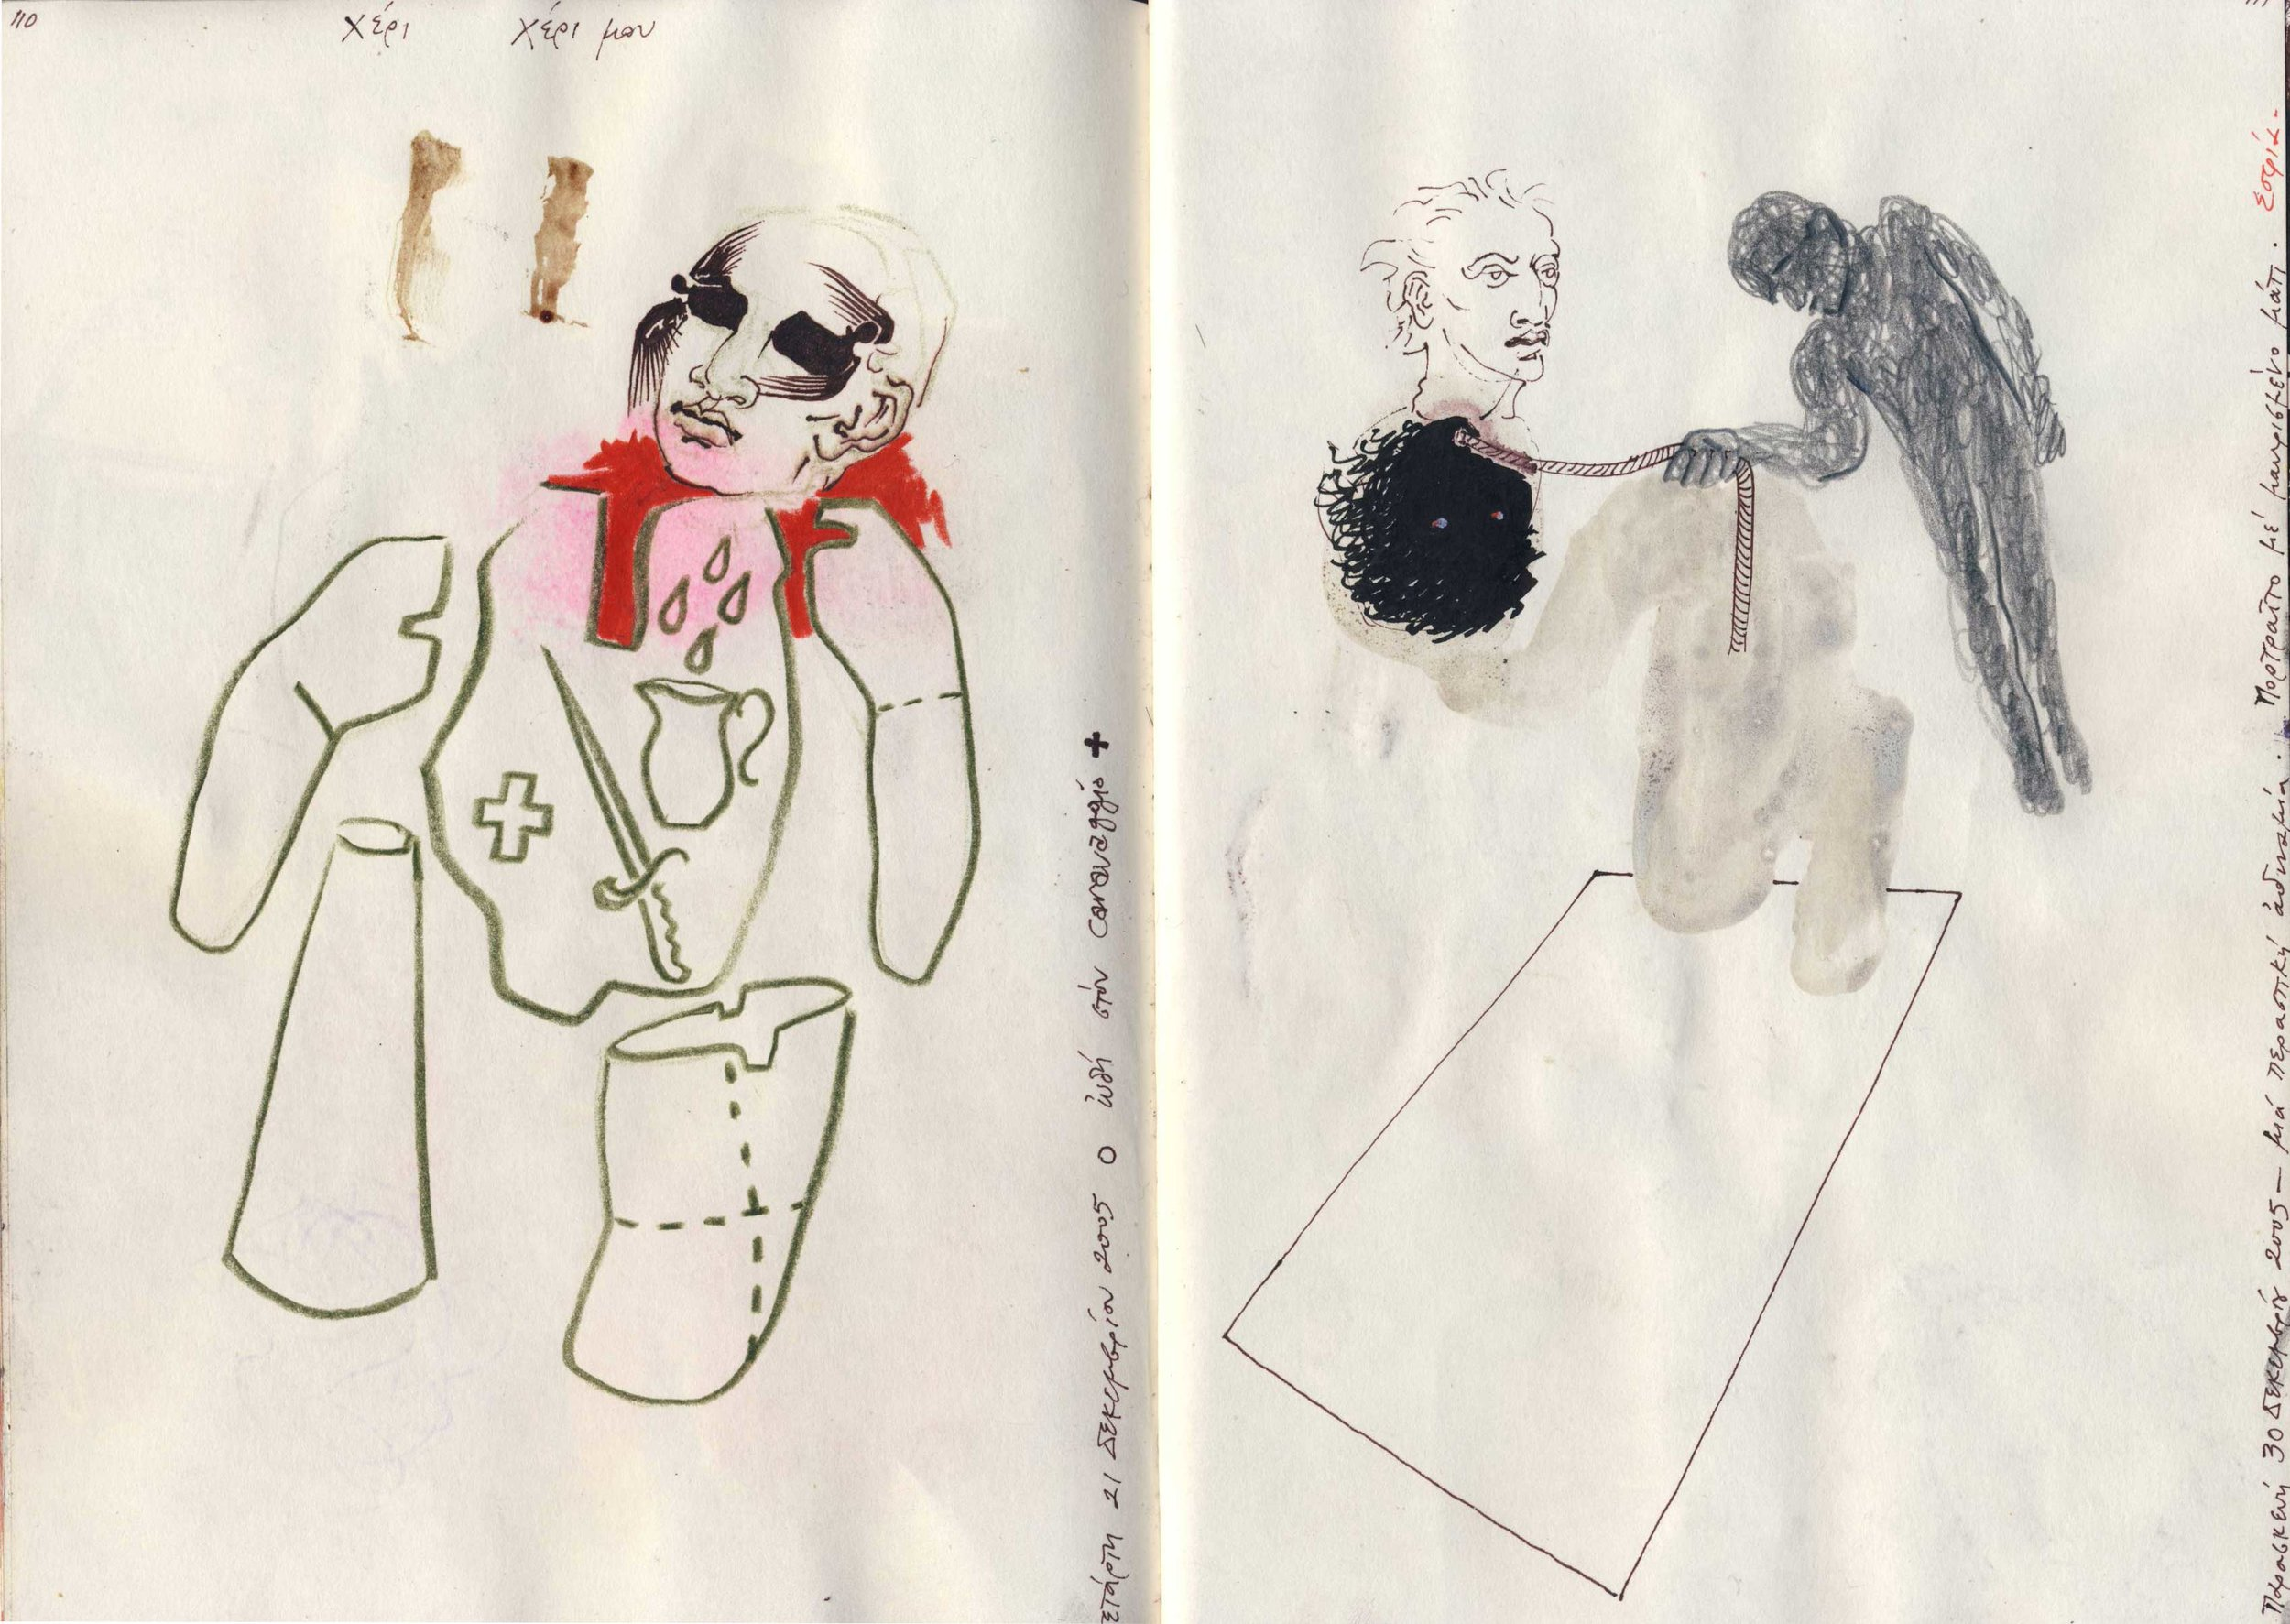 diary 12 page 40-41